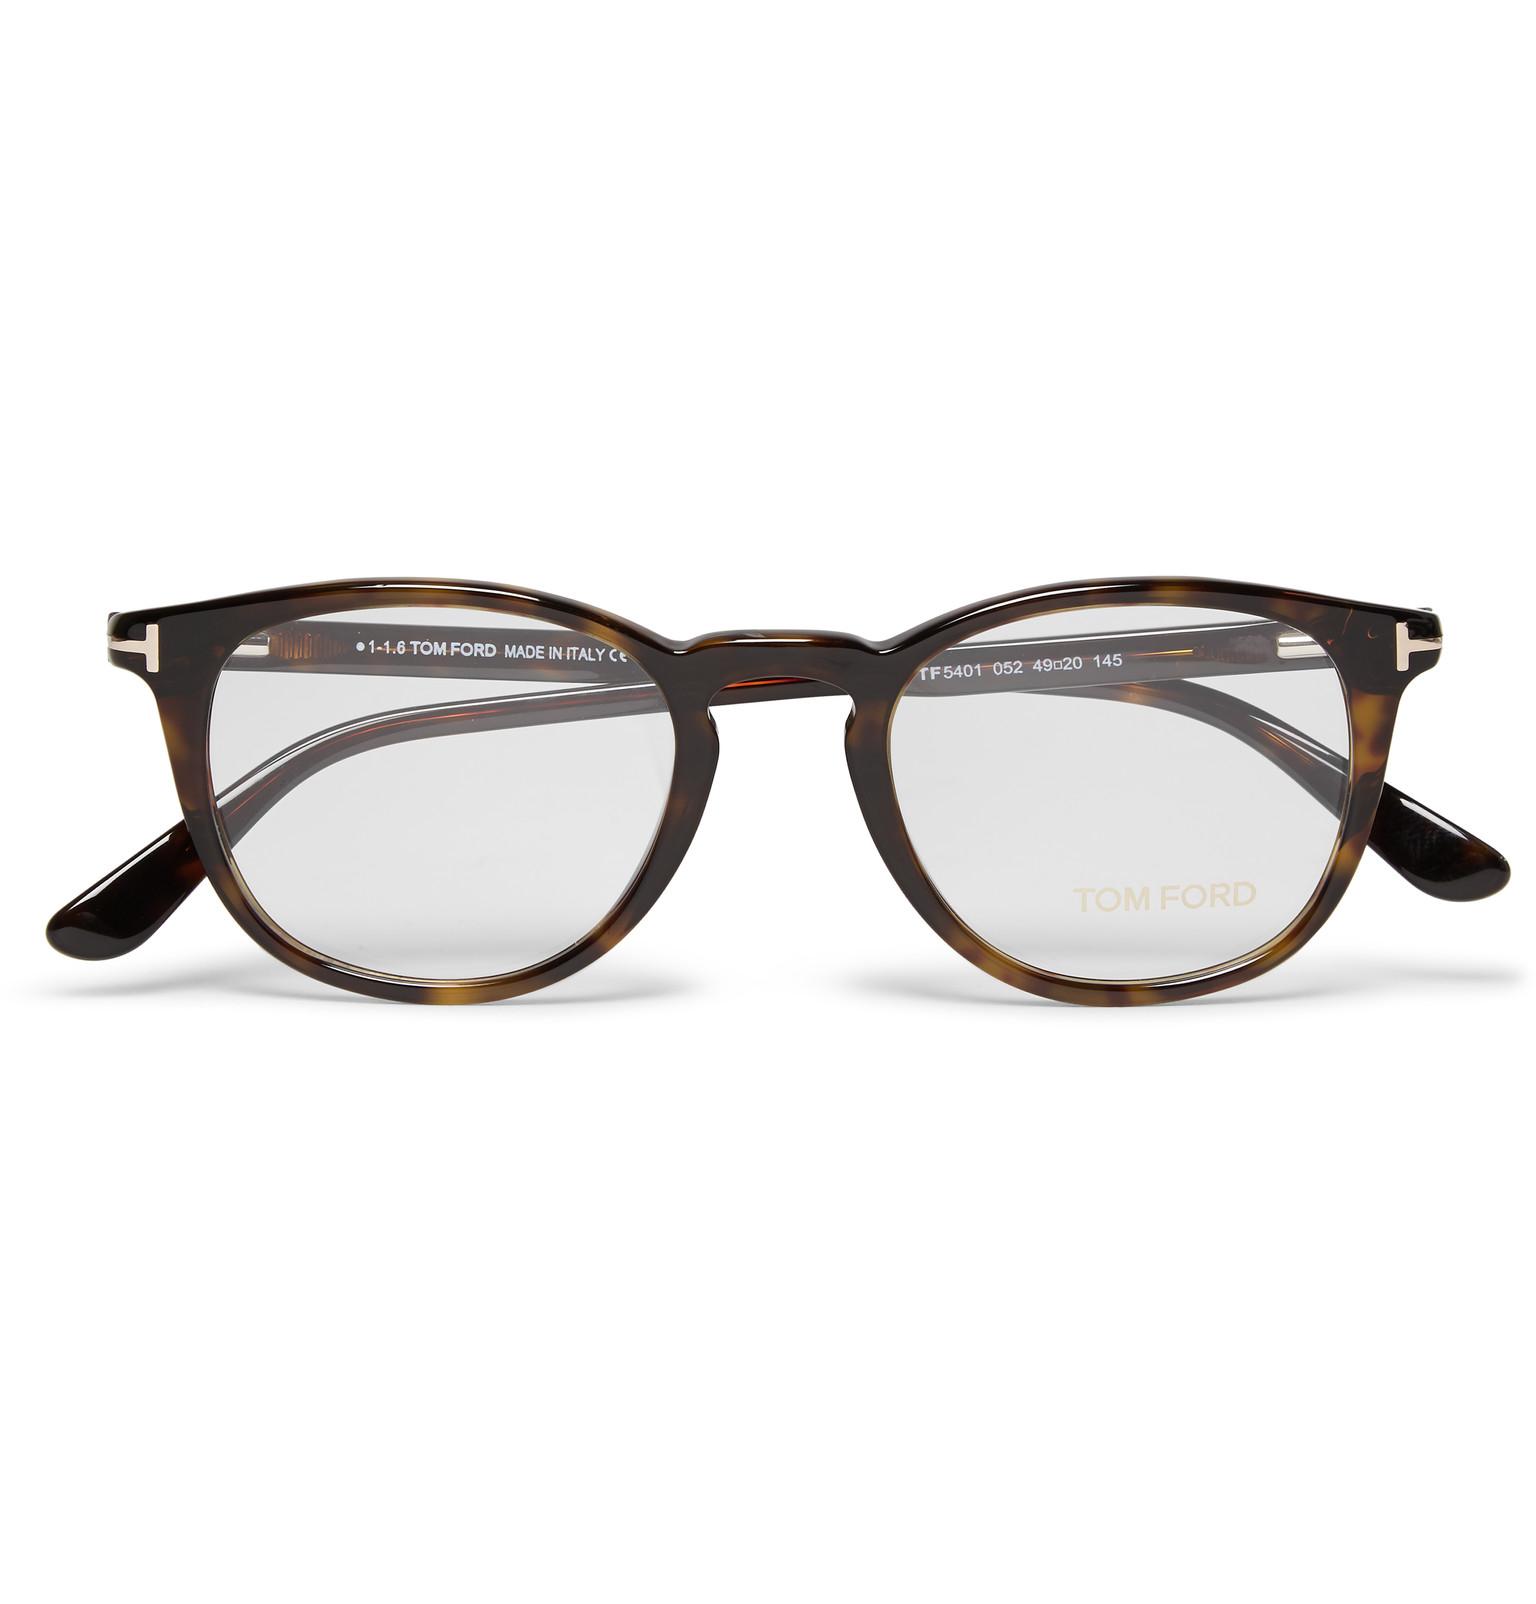 093f41c9b8 Tom Ford Round-frame Tortoiseshell Acetate Optical Glasses in Brown ...